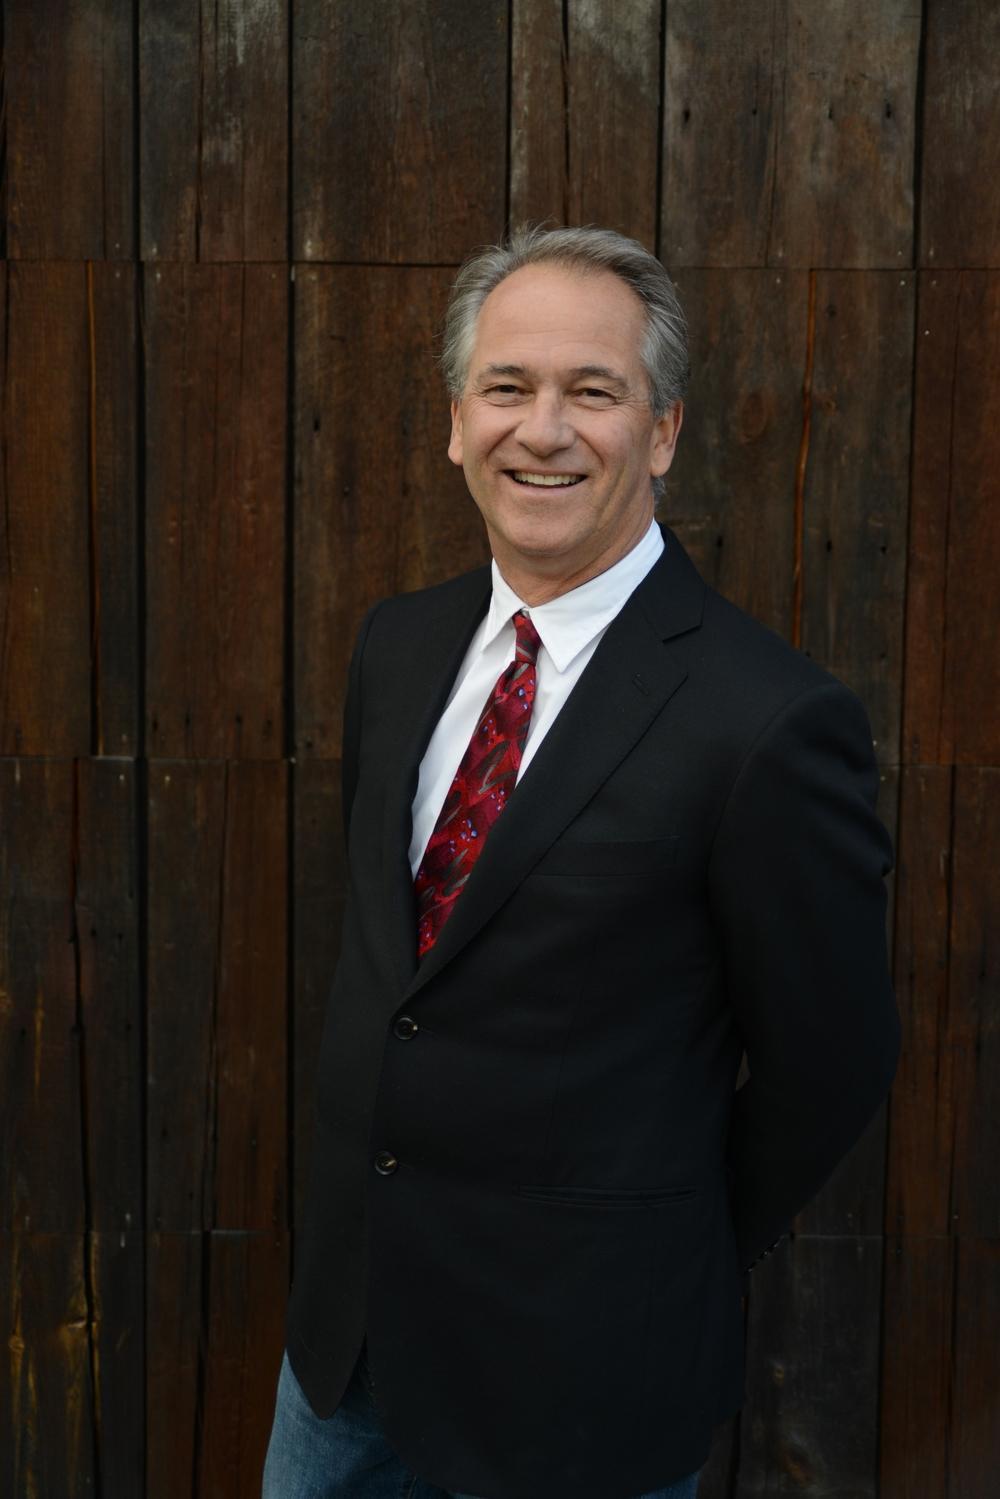 John Lavicka, CDT, Owner